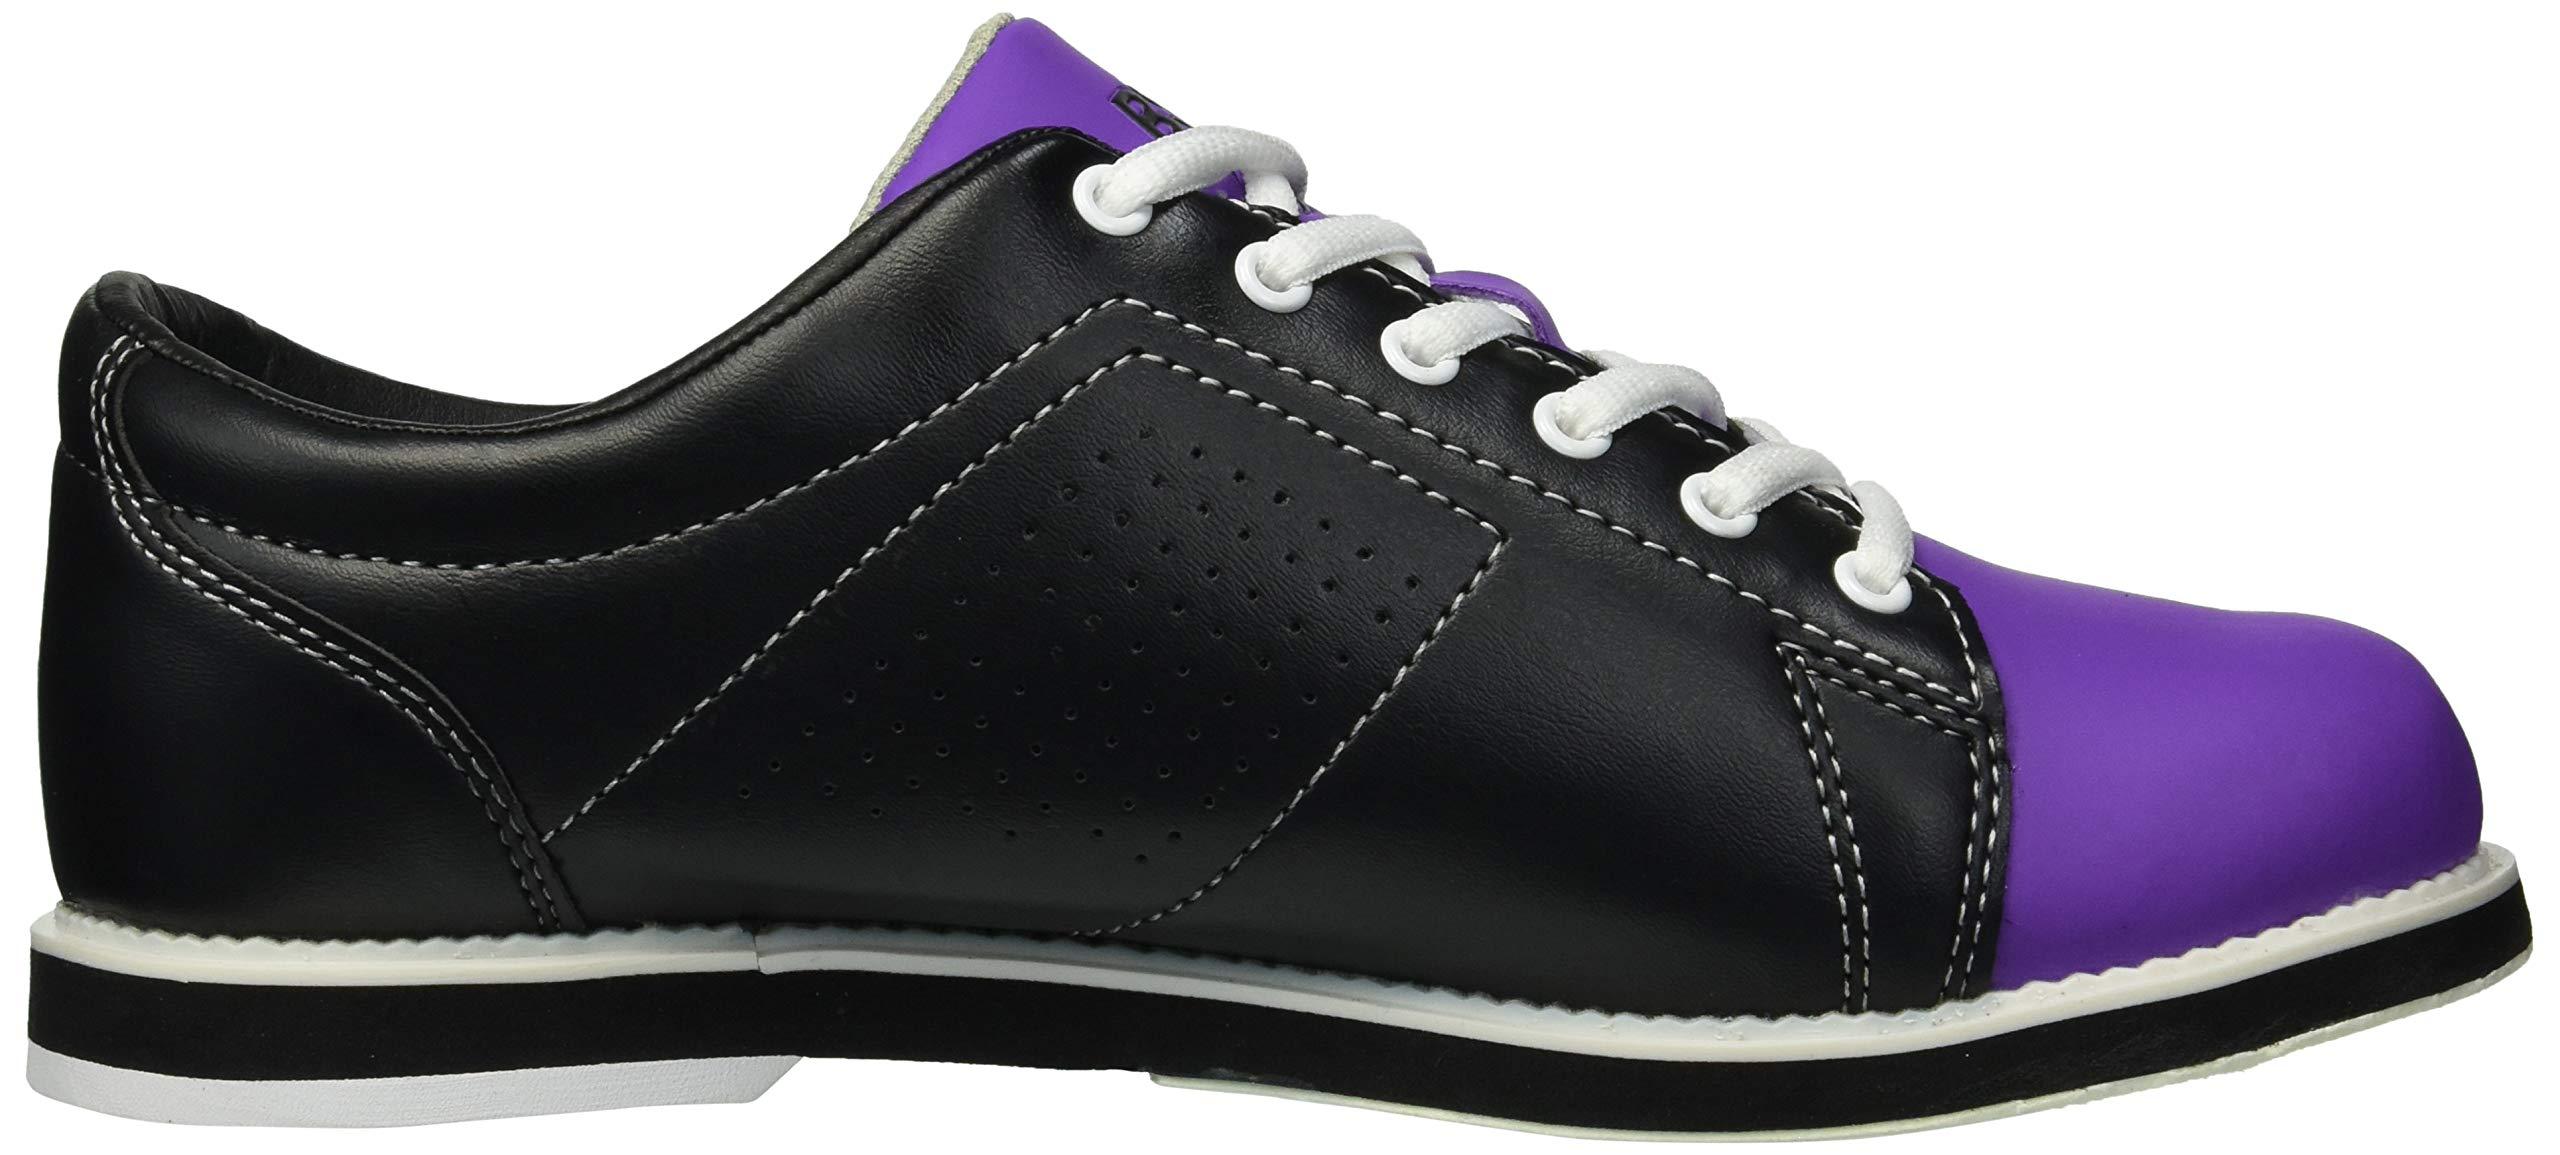 BSI 654 Women's Classic #654, Black/Purple, 7.0 by BSI (Image #7)